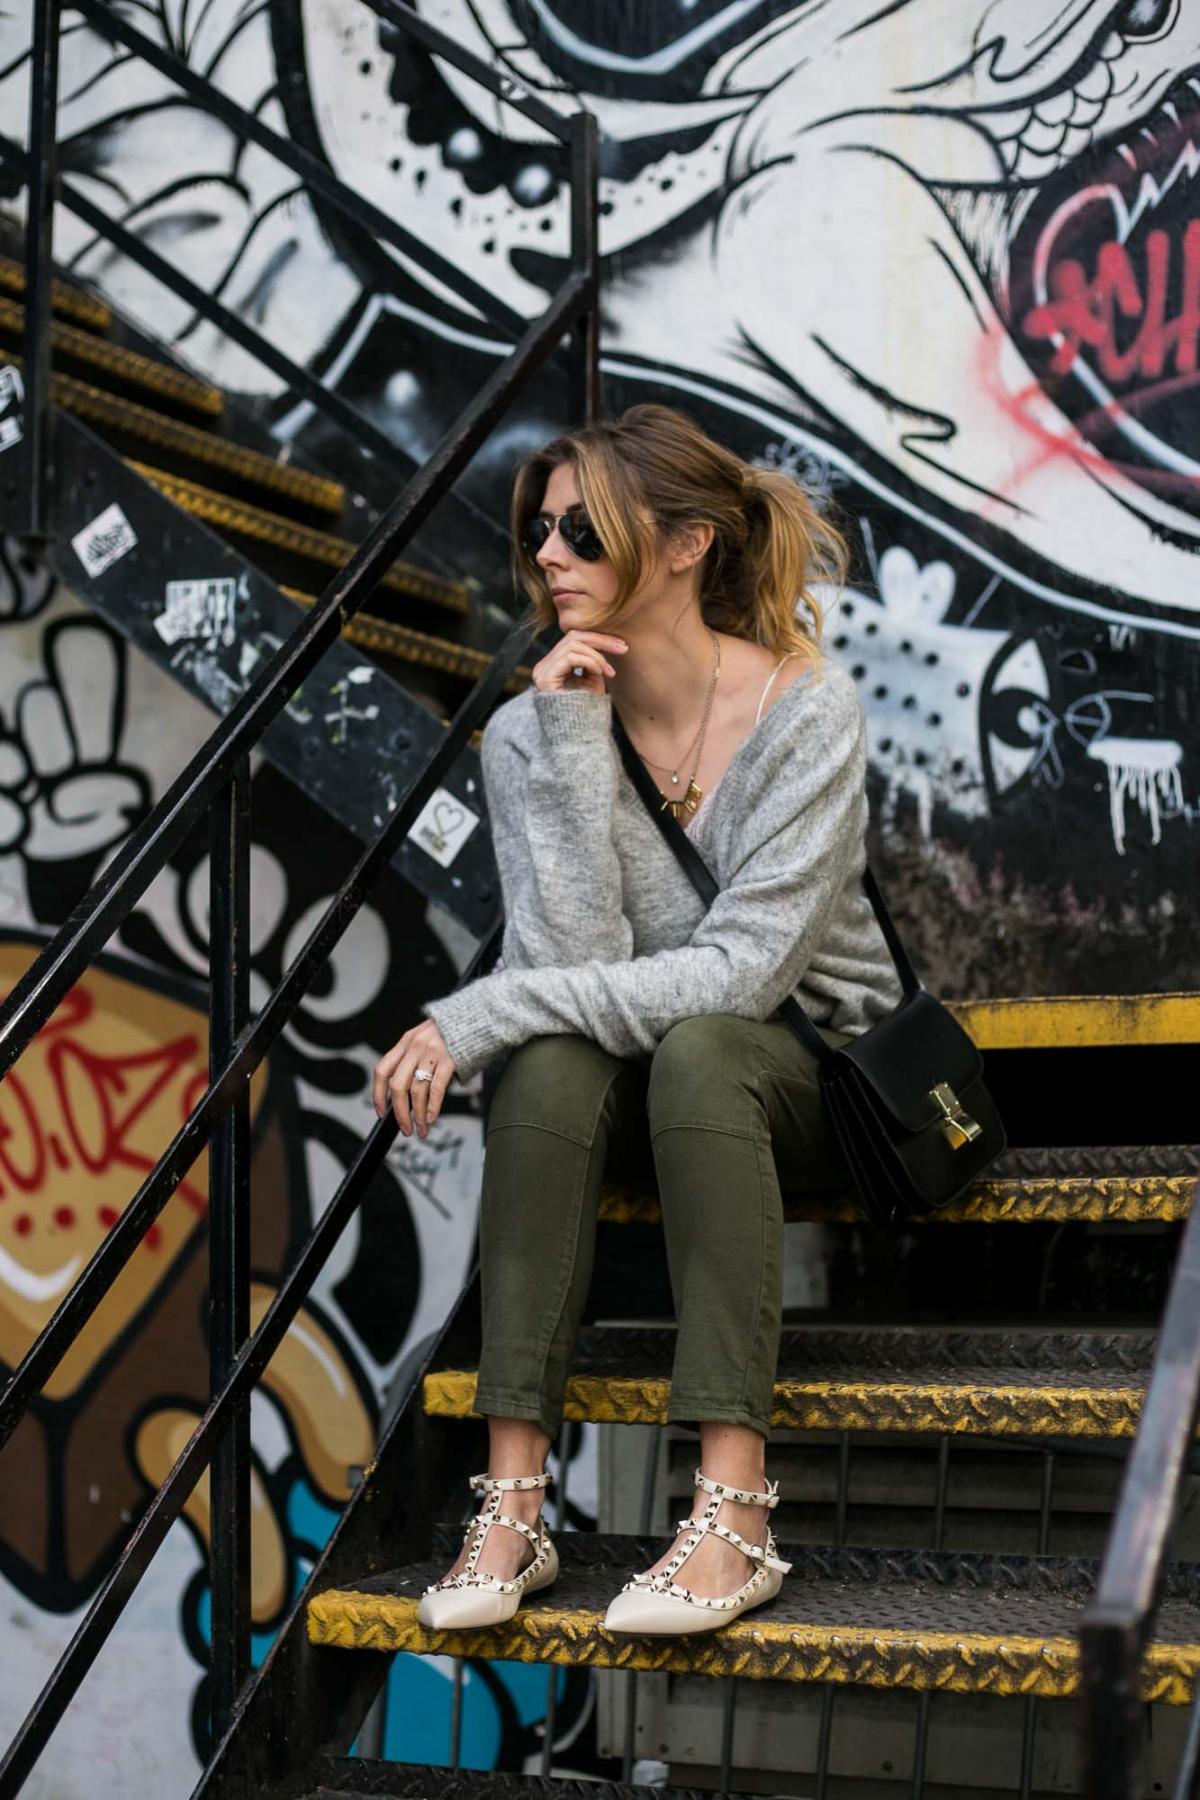 cream valentino rockstud flats, khaki trousers, grey v neck jumper, celine box bag, london street style